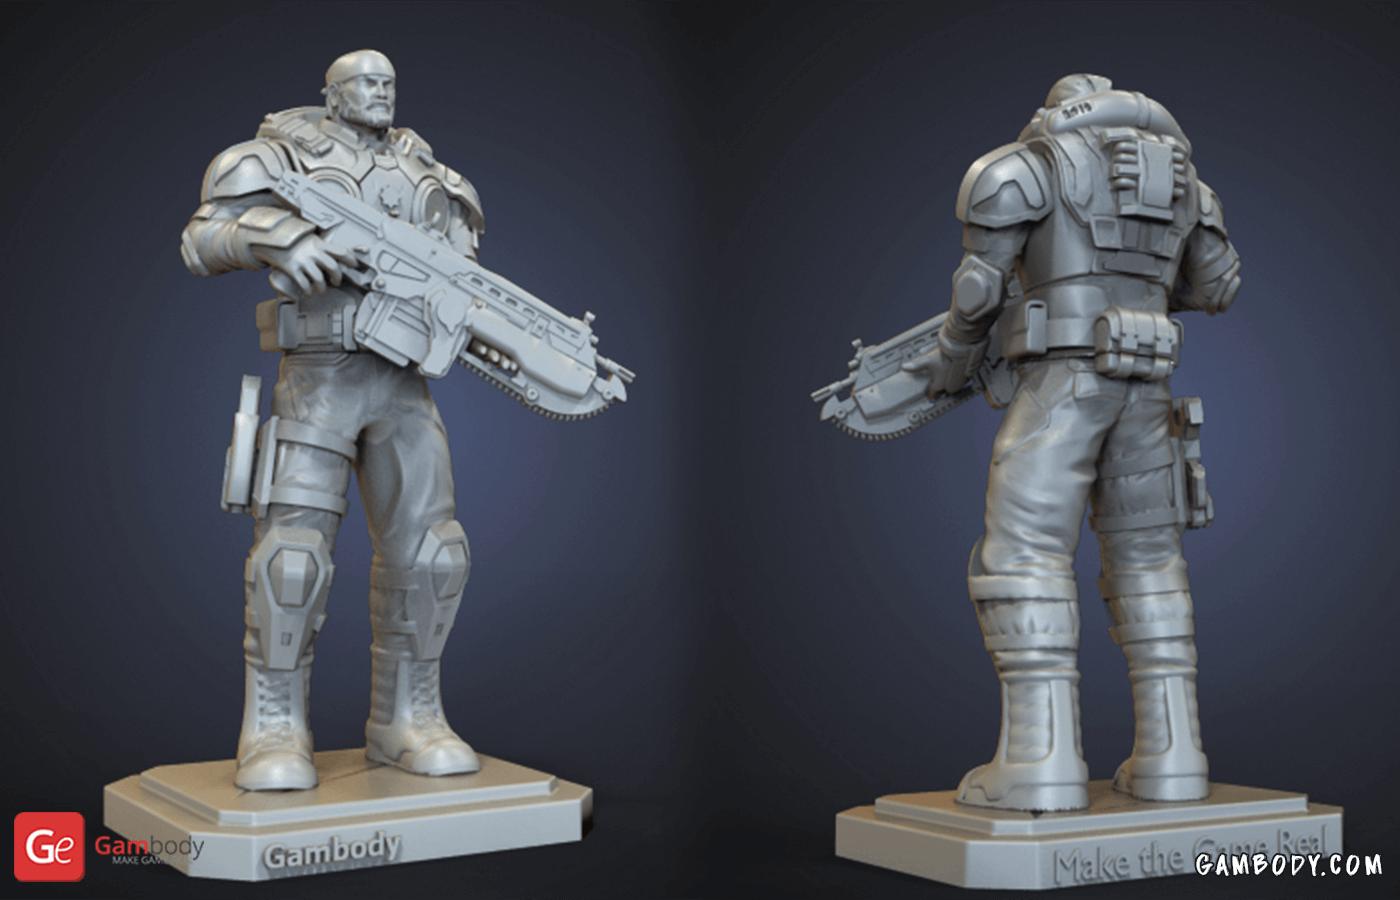 Marcus Fenix 3D Printing Figurine